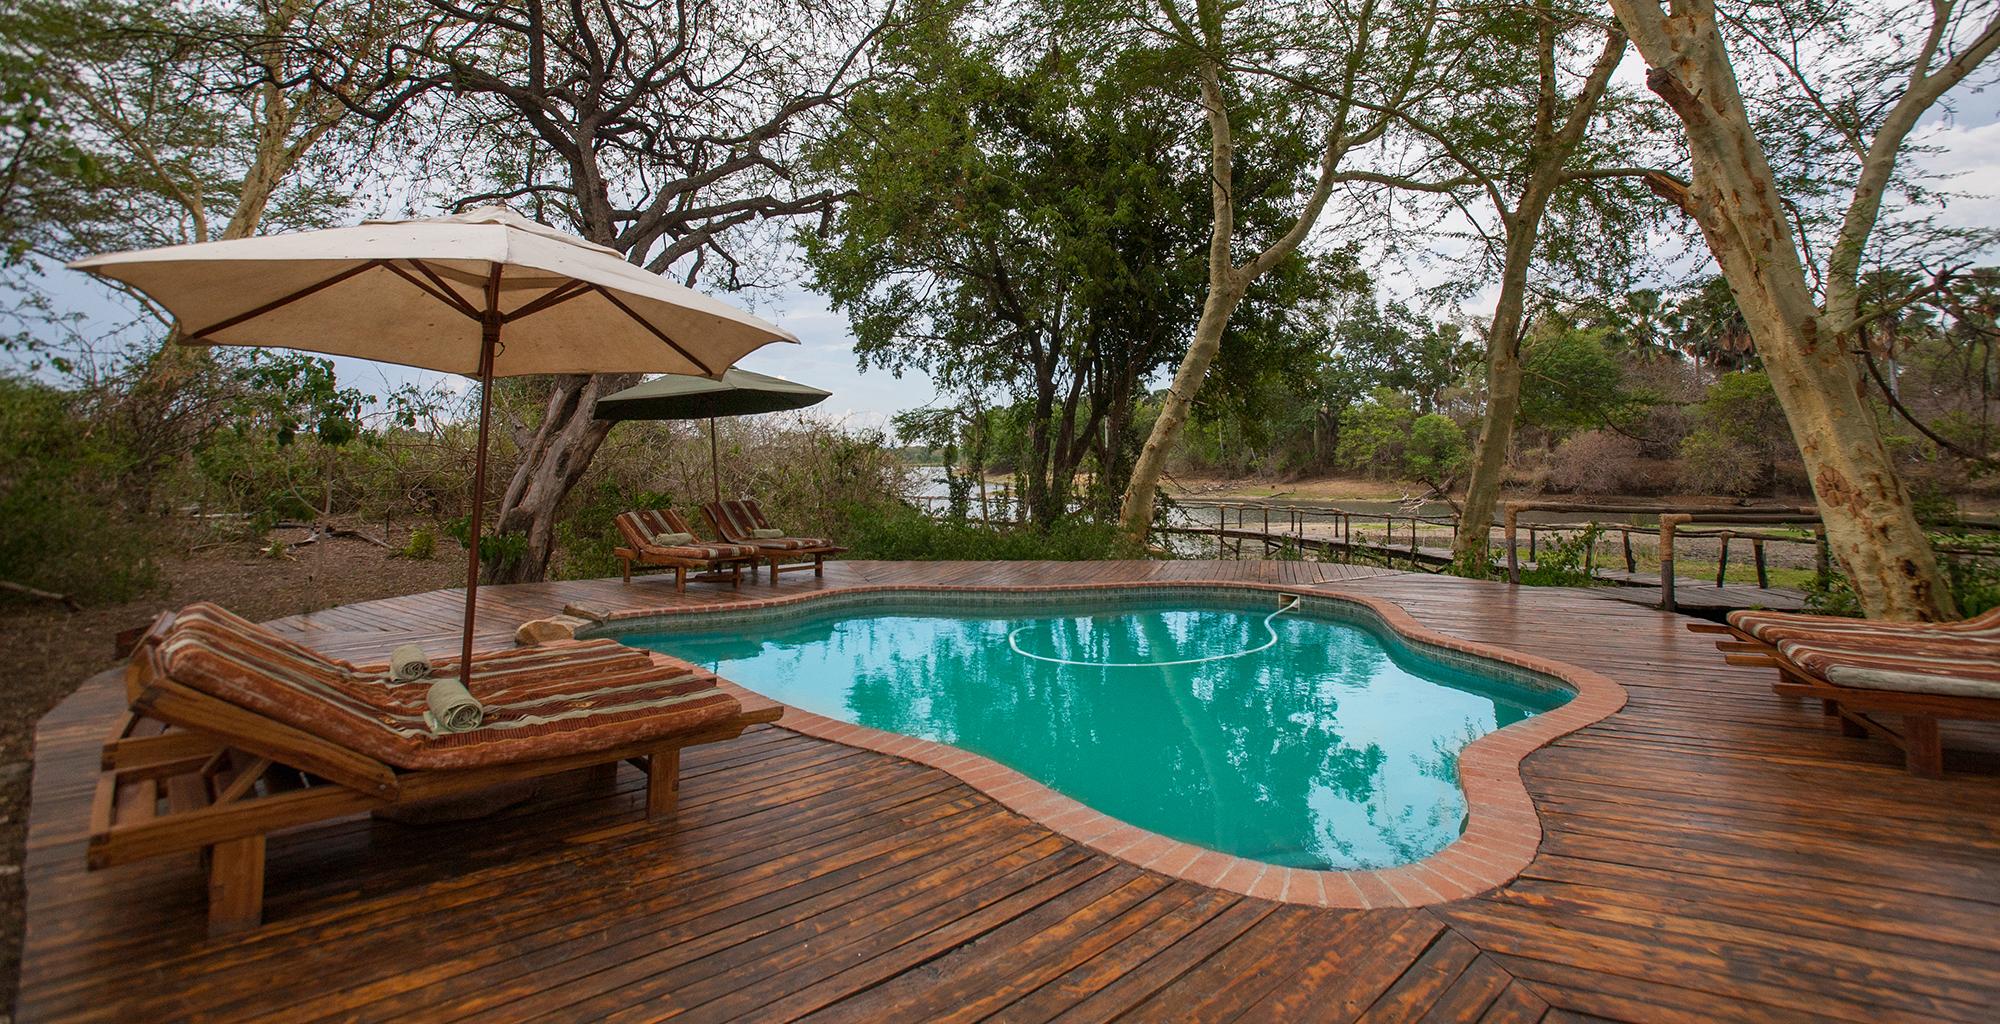 Malawi-Liwonde-National-Park-Mvuu-Lodge-Swimming-Pool